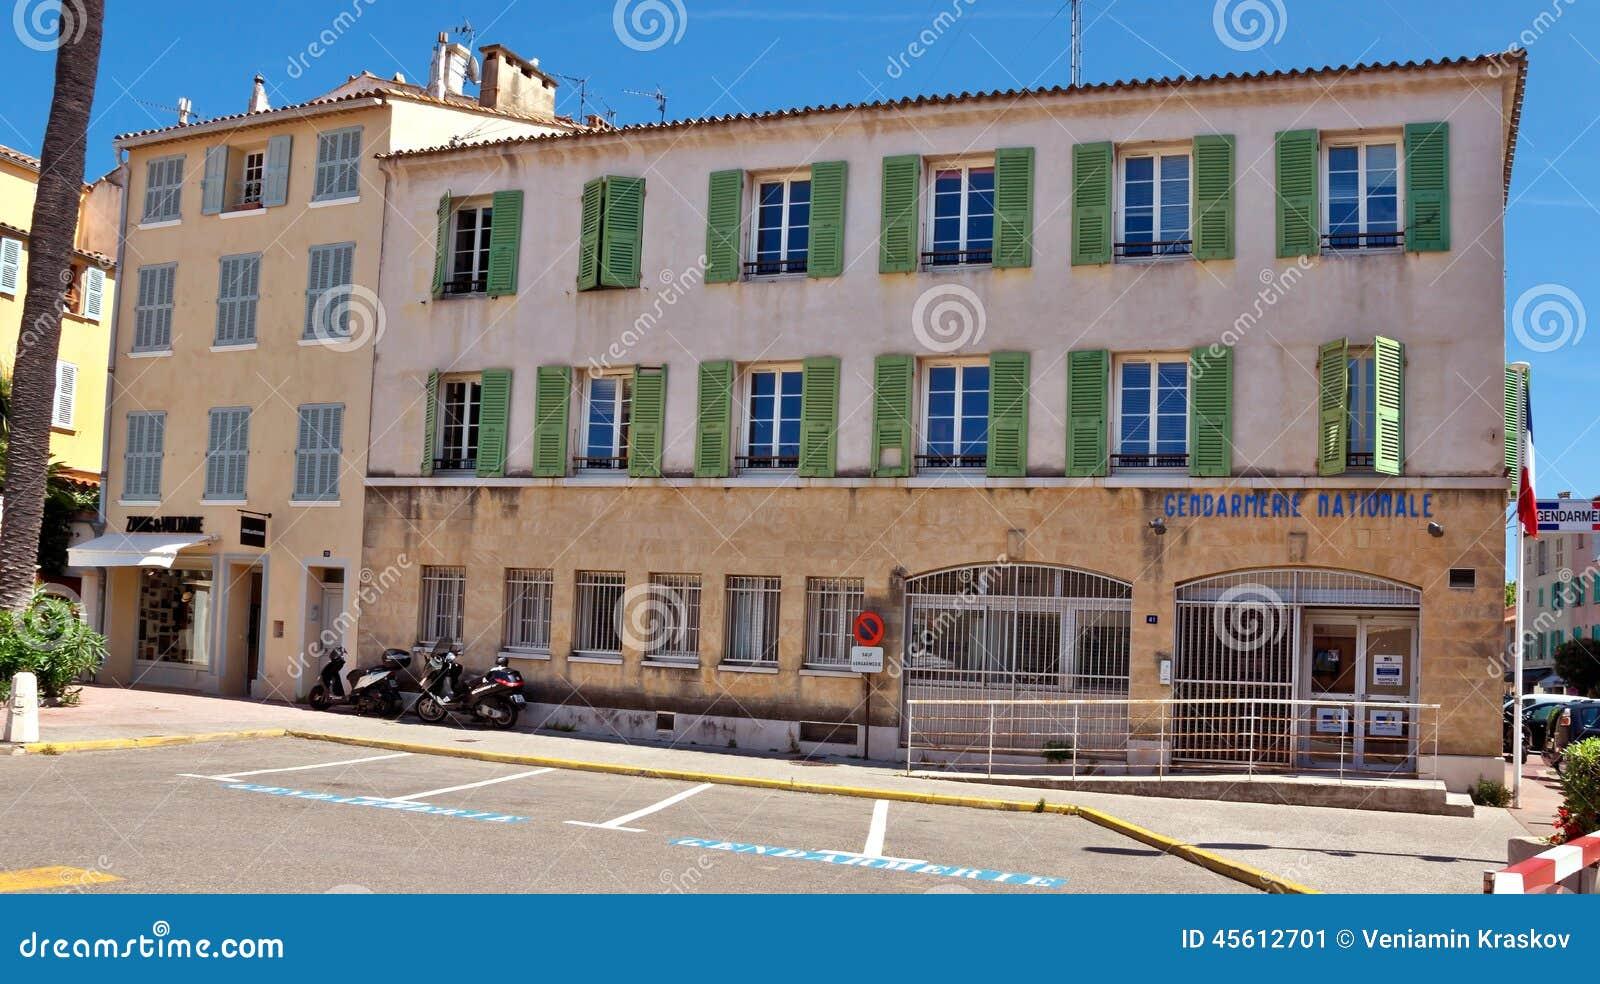 saint tropez gendarmerie building editorial photo image of pavement france 45612701. Black Bedroom Furniture Sets. Home Design Ideas